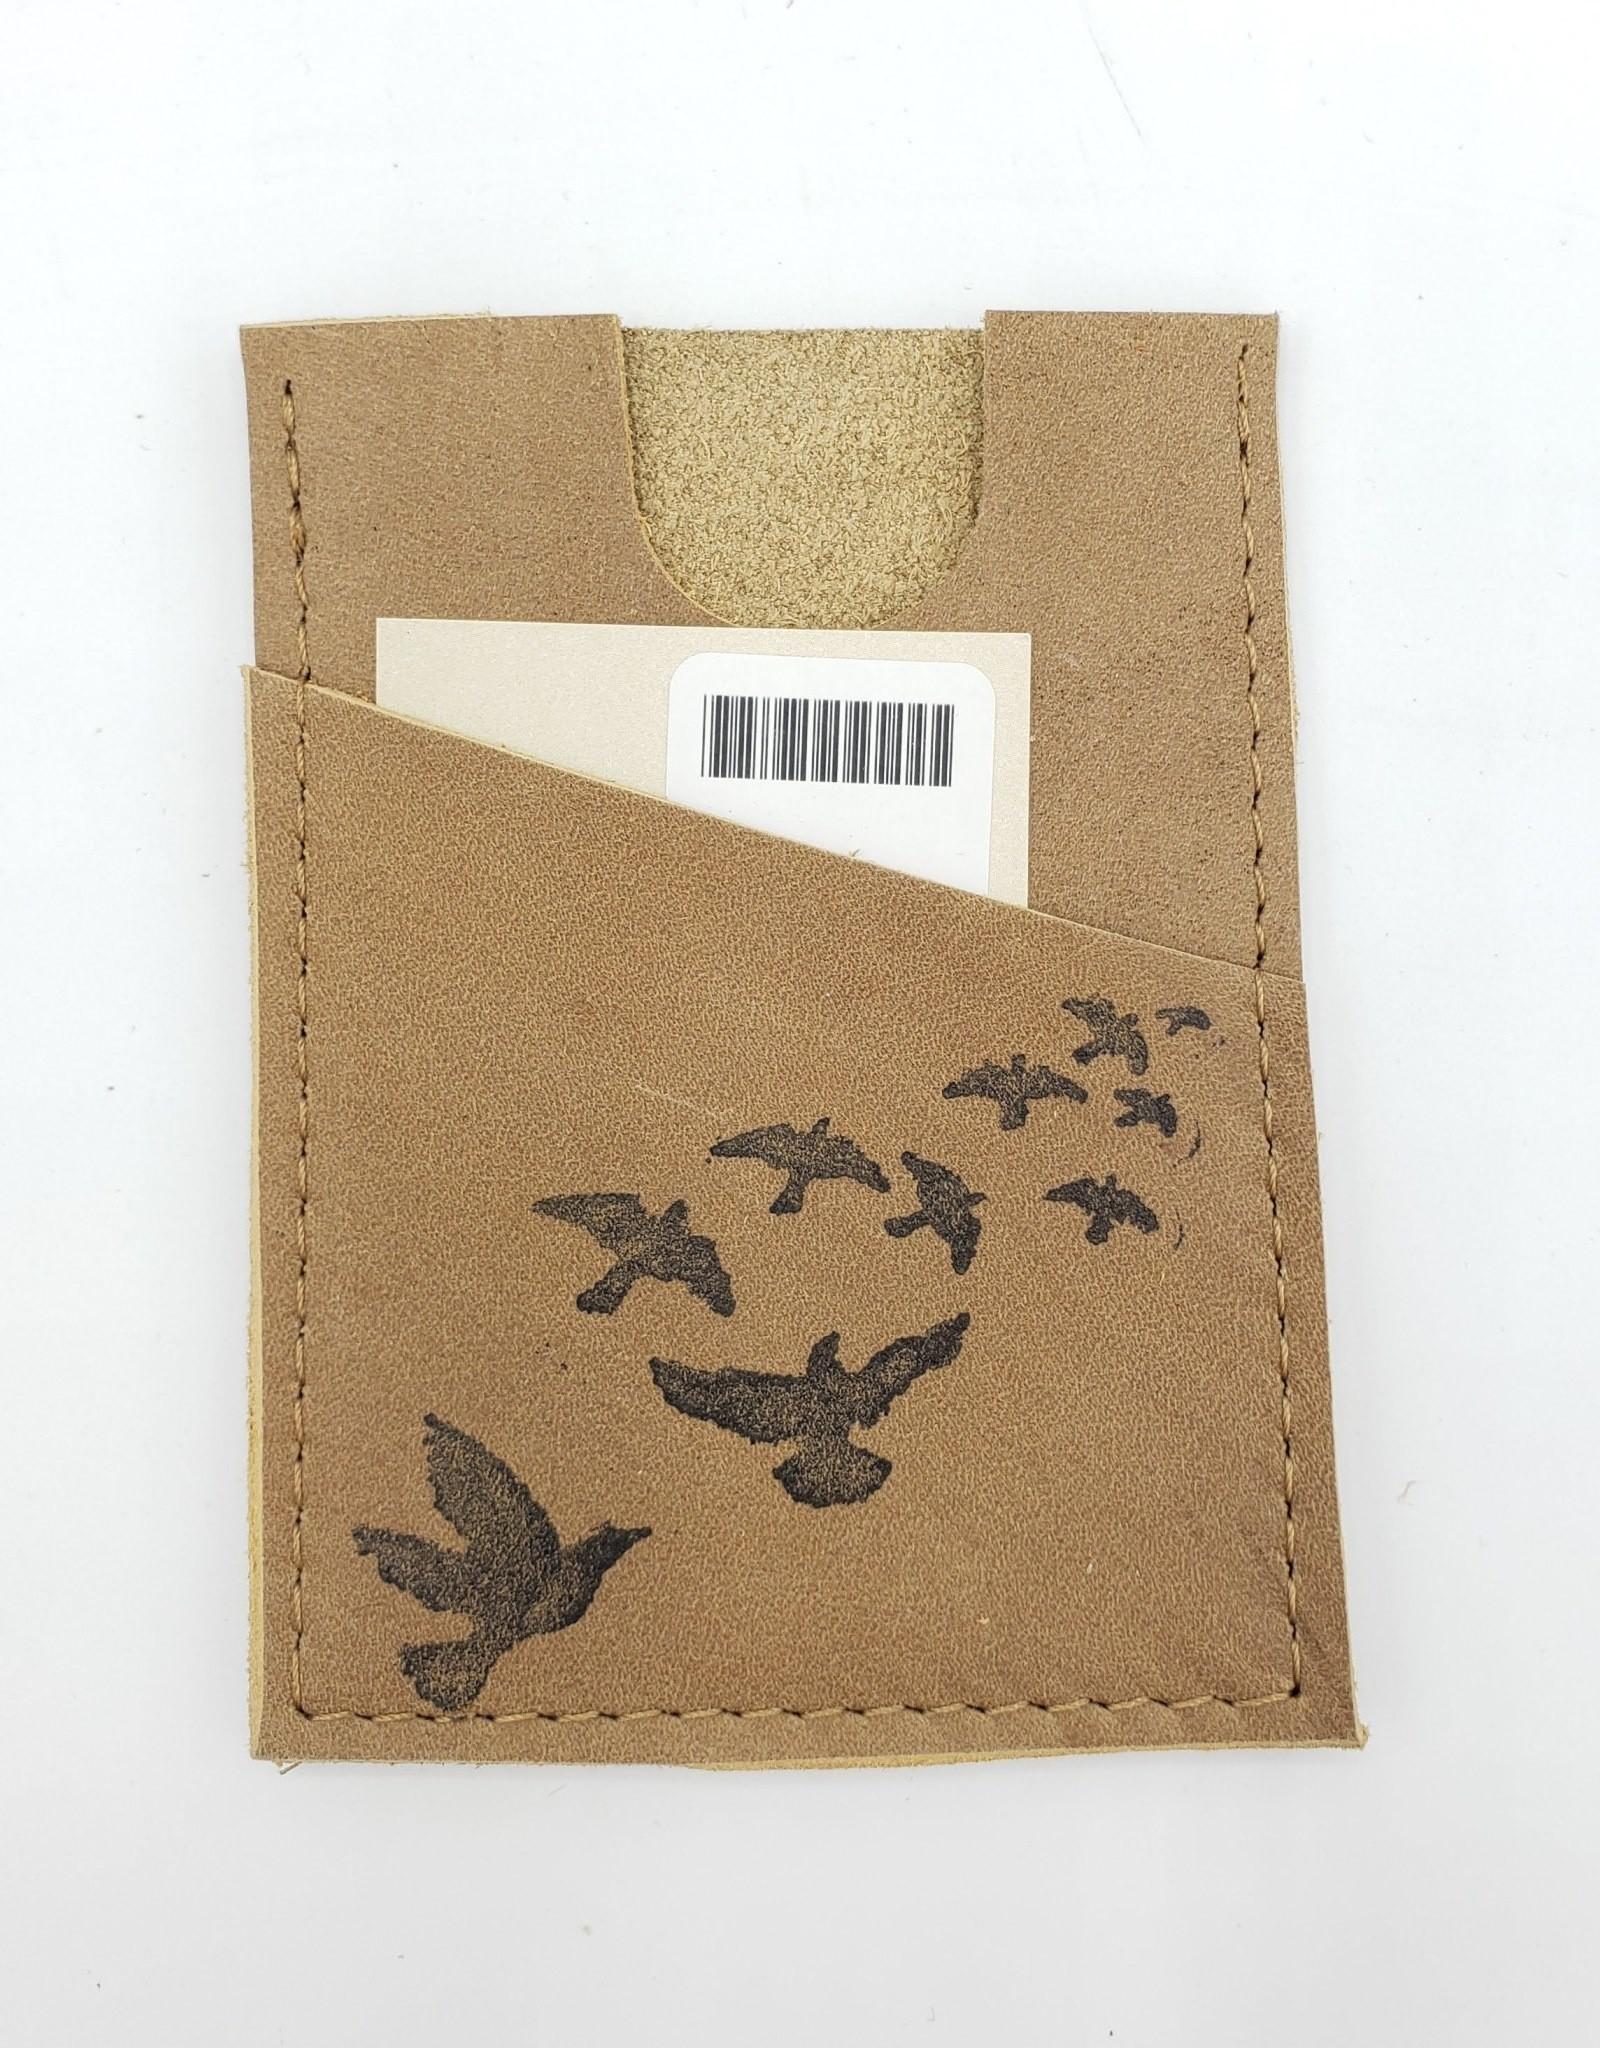 In Blue Handmade Flock of Birds - Train Ticket & Card Leather Wallet